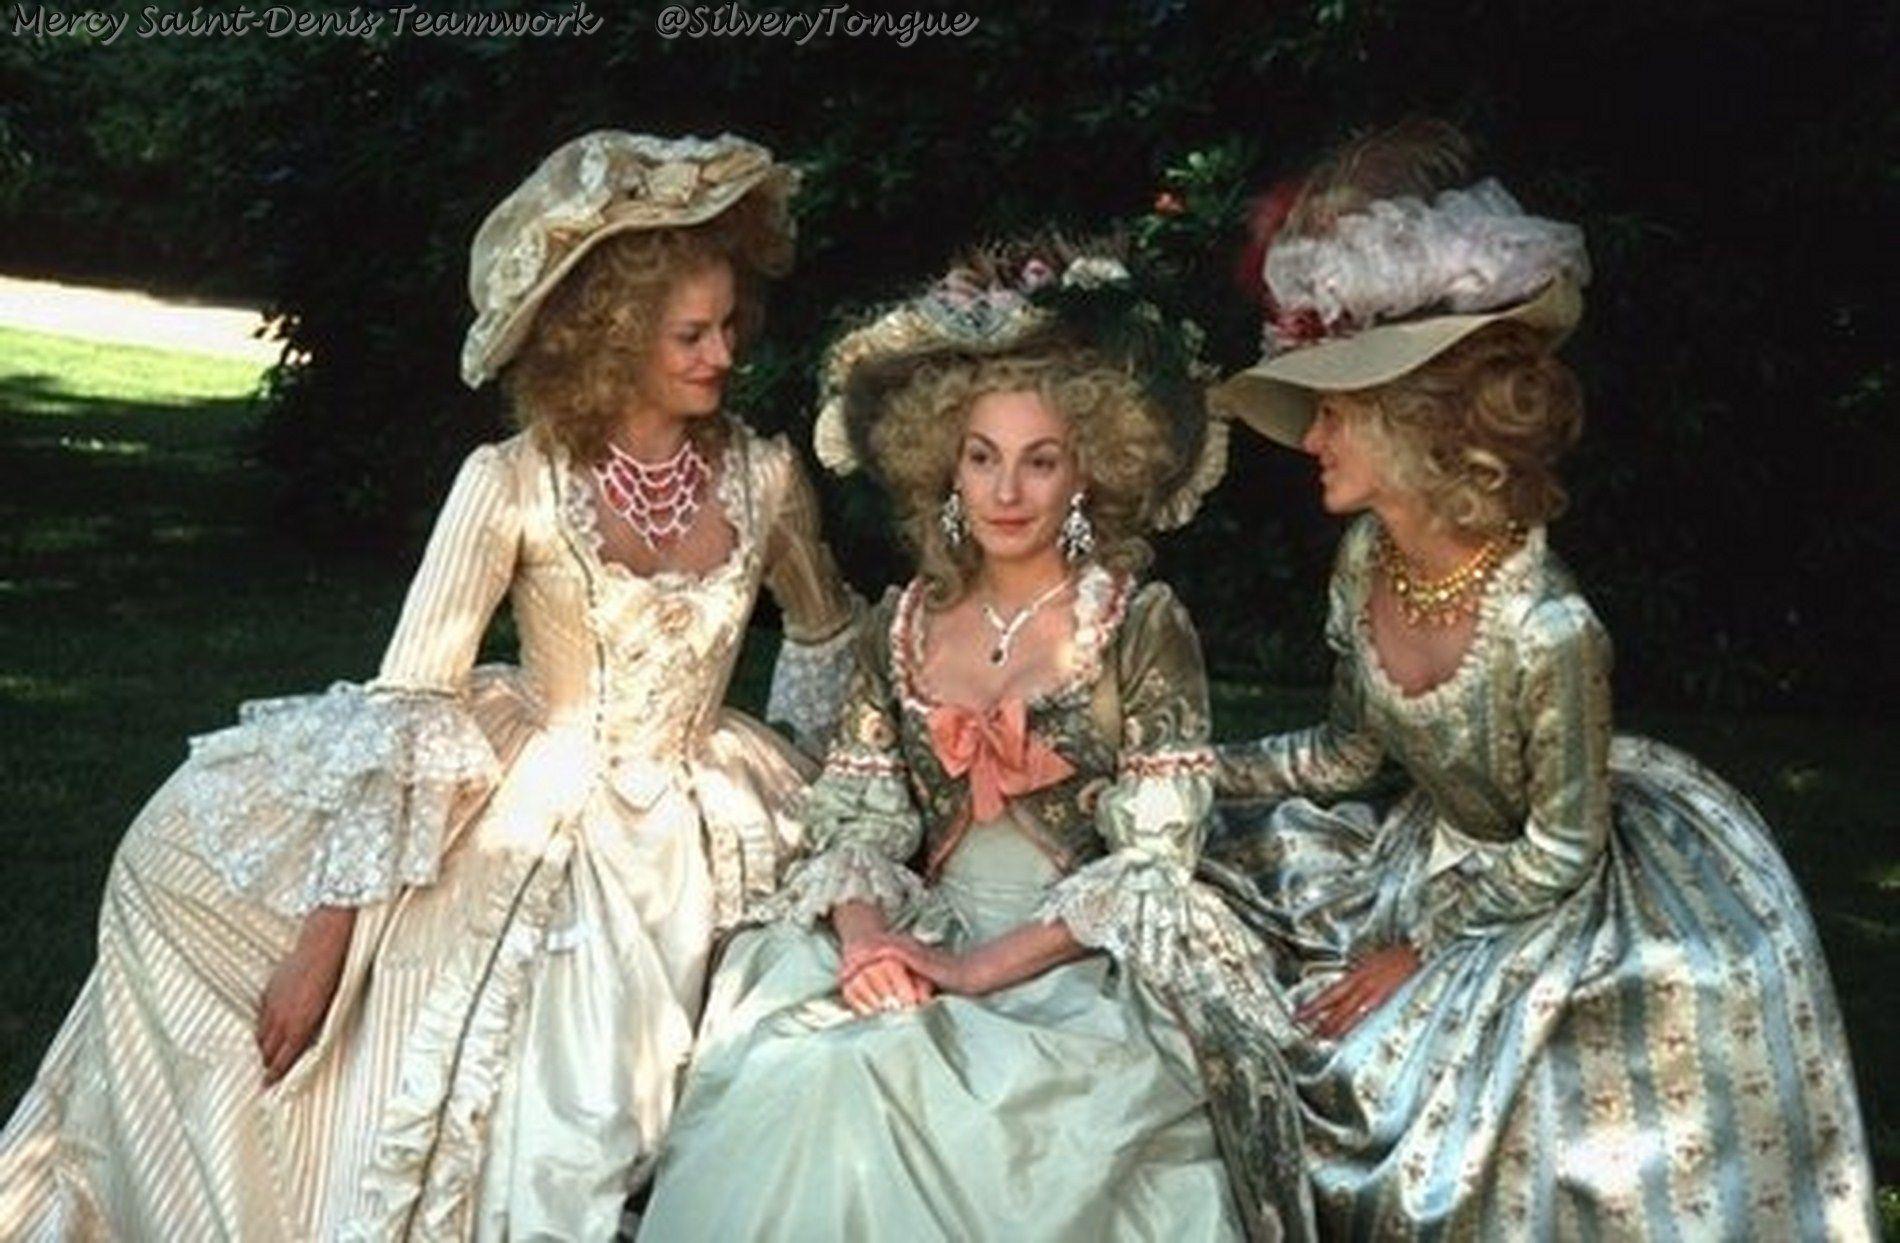 L'autrichienne (1990) - Ute Lemper as Marrie Antoinette. | 18th century  fashion, Historical dresses, 18th century costume